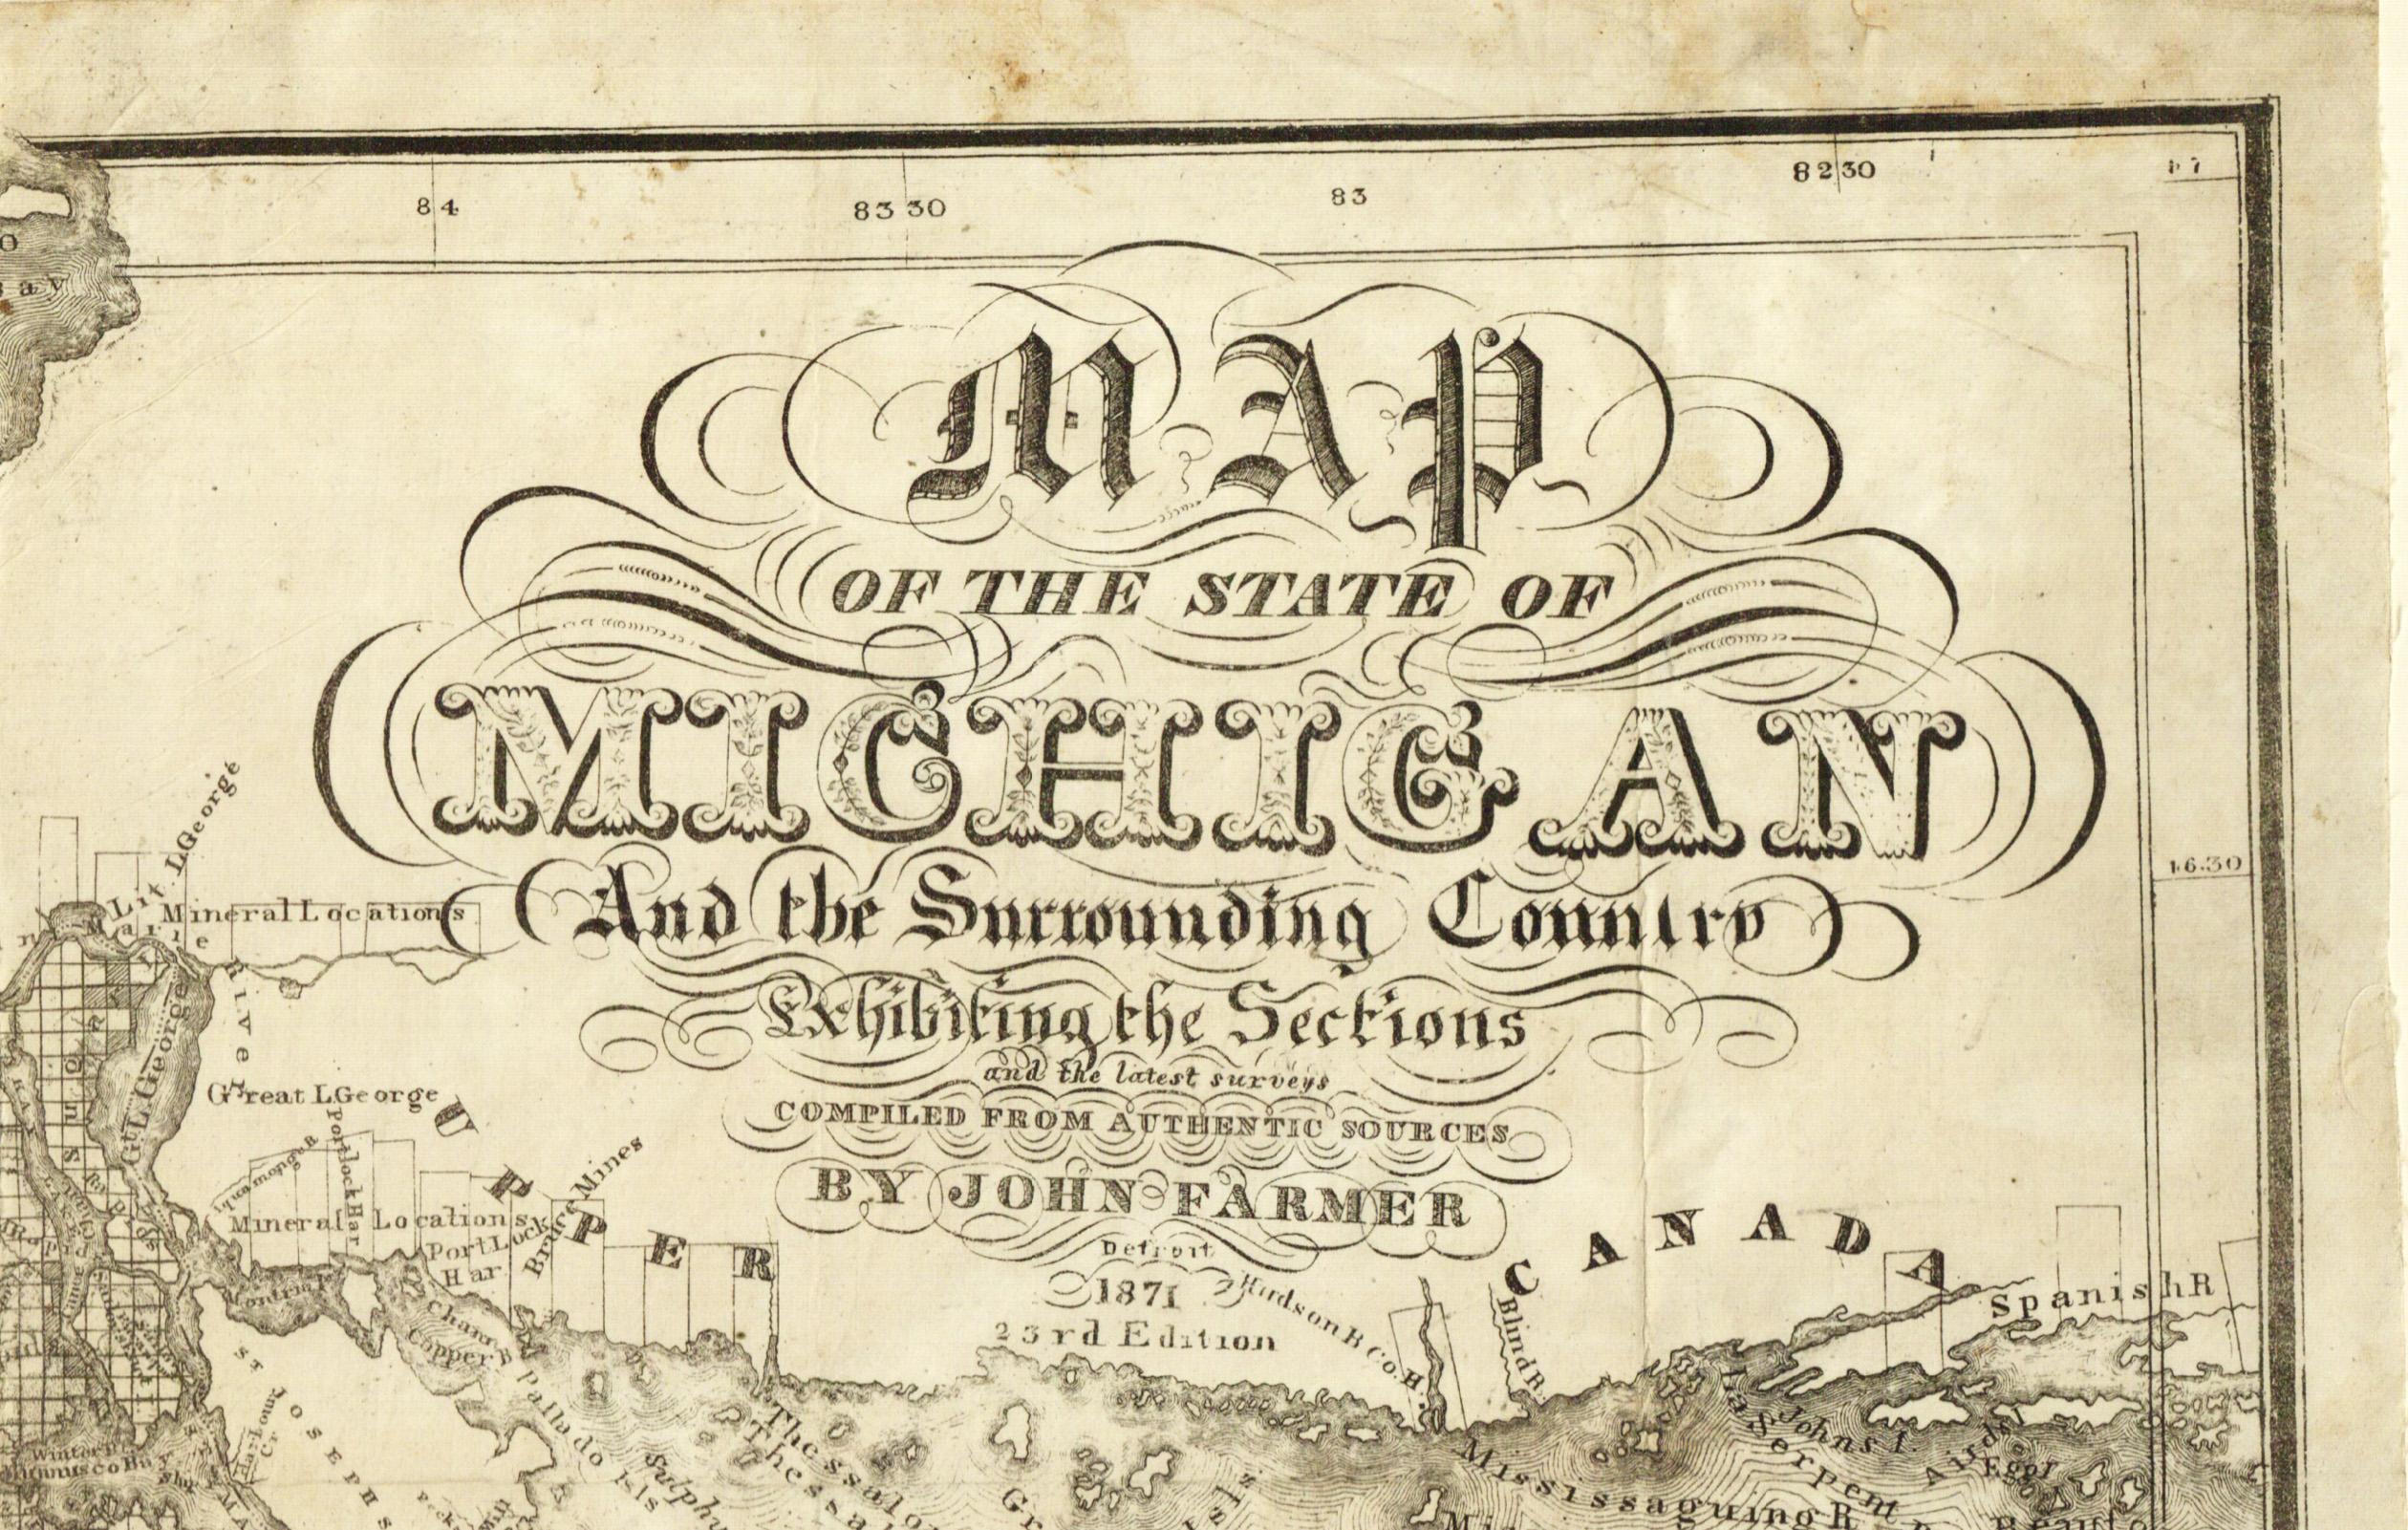 Cartouche John Farmer Map Library MSU Libraries - United states district court jurisdiction map